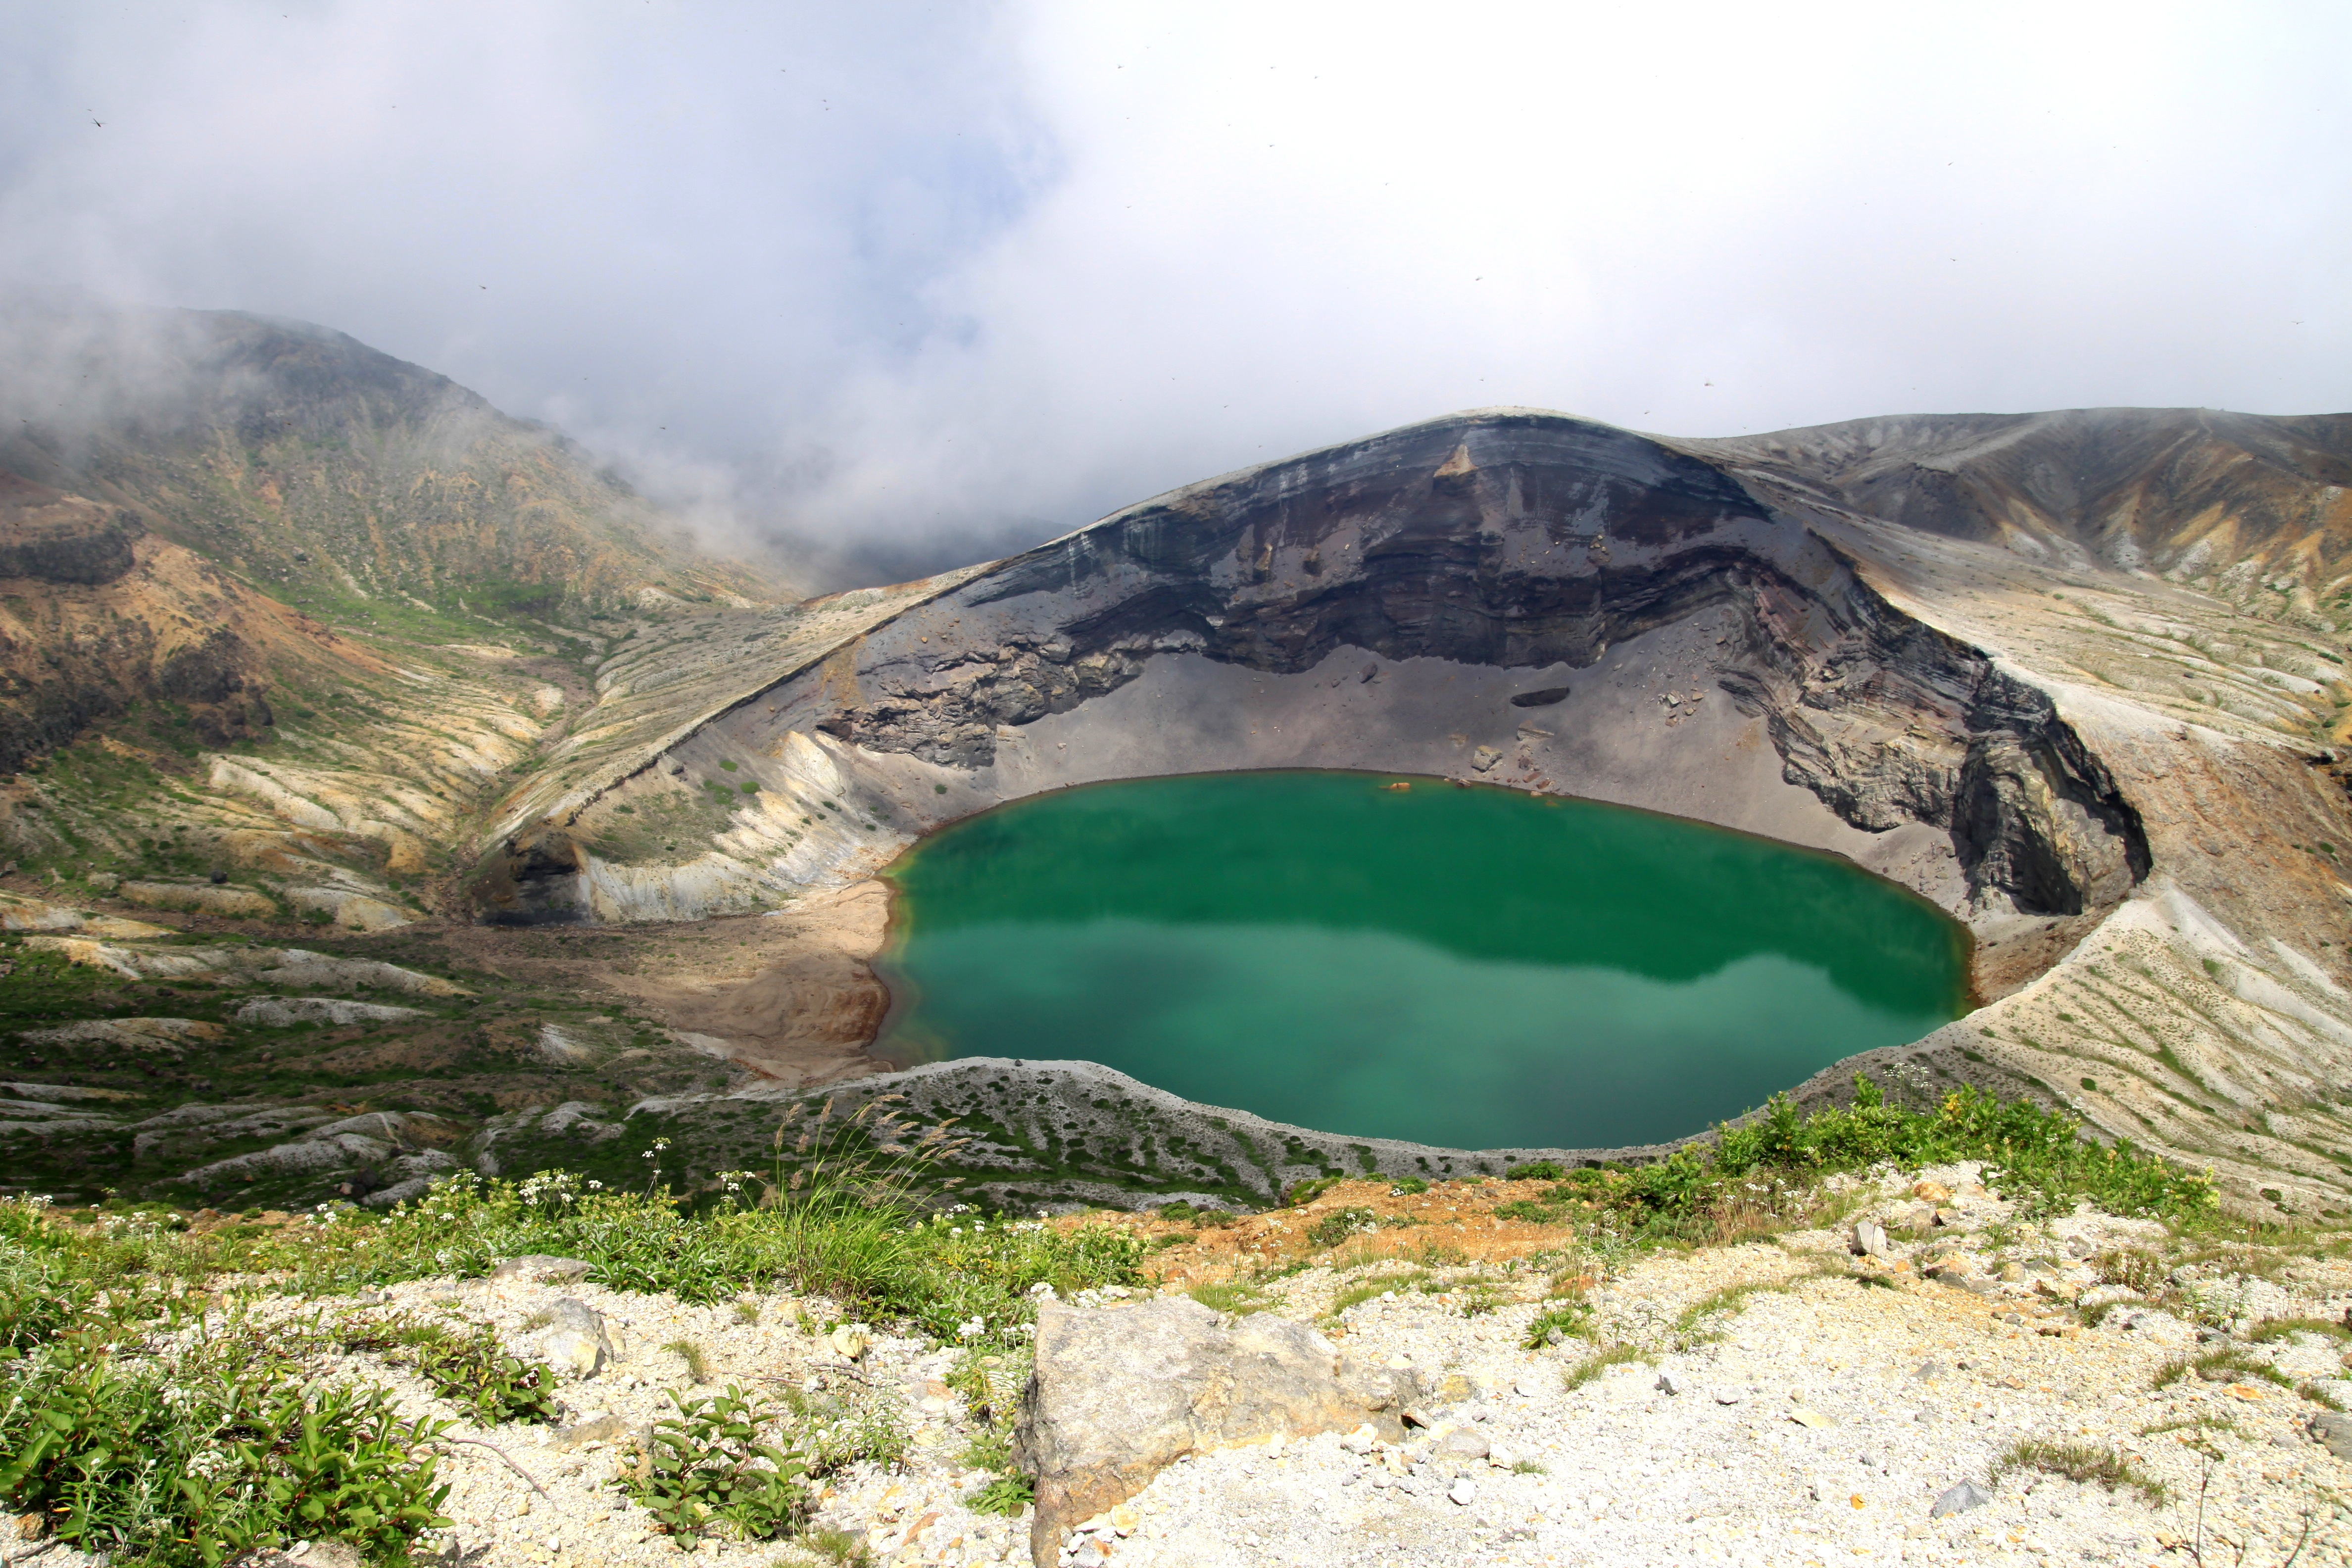 Okama Crater Lake, Yamagata, Japan